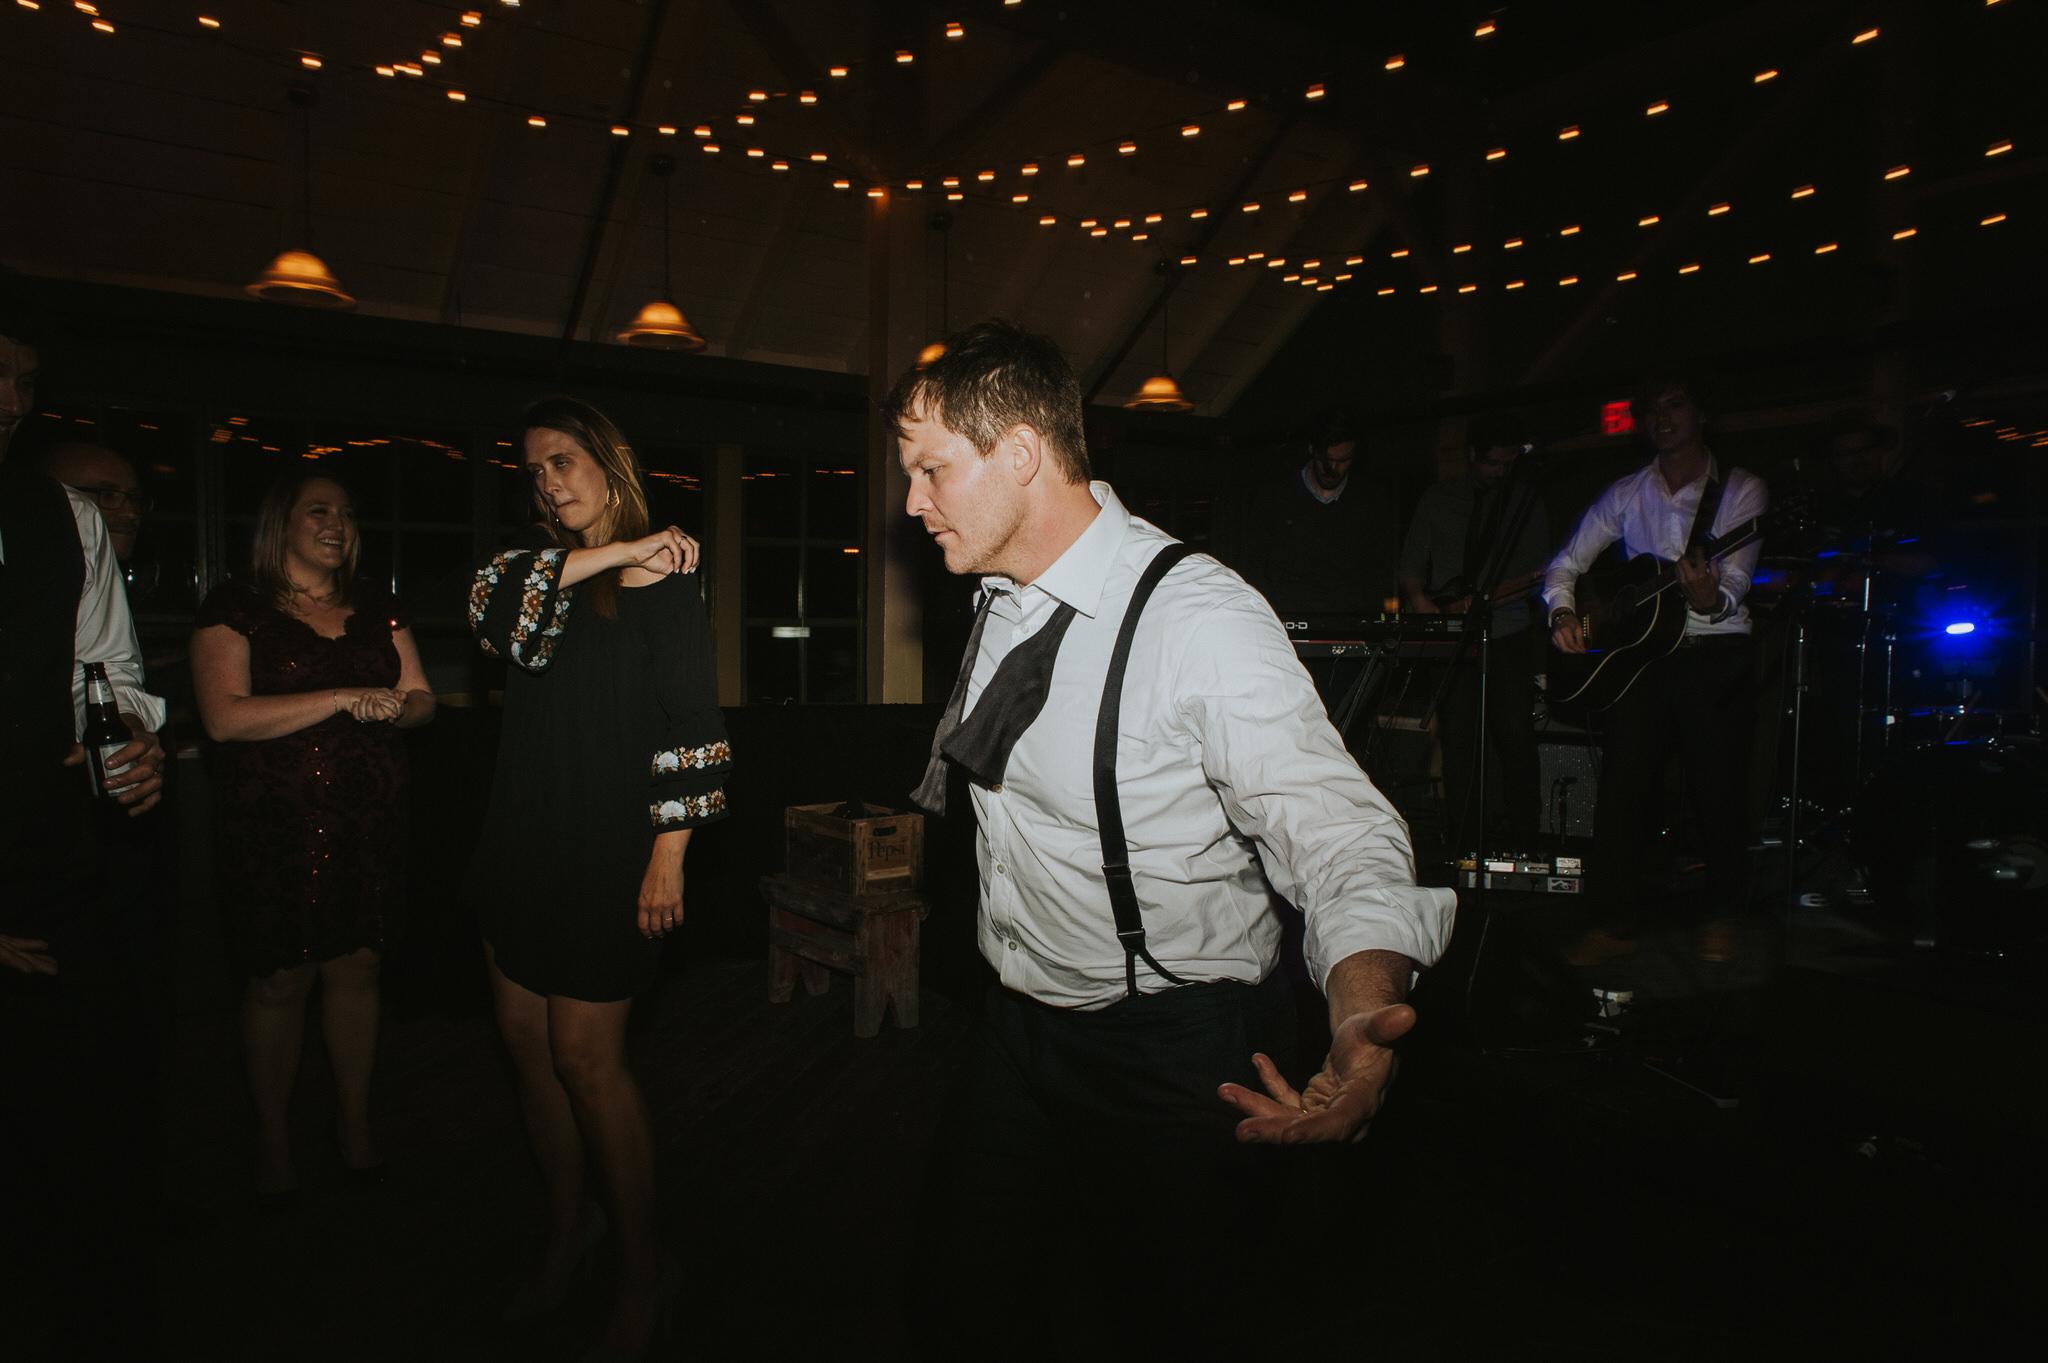 scarletoneillphotography_weddingphotography_prince edward county weddings216.JPG